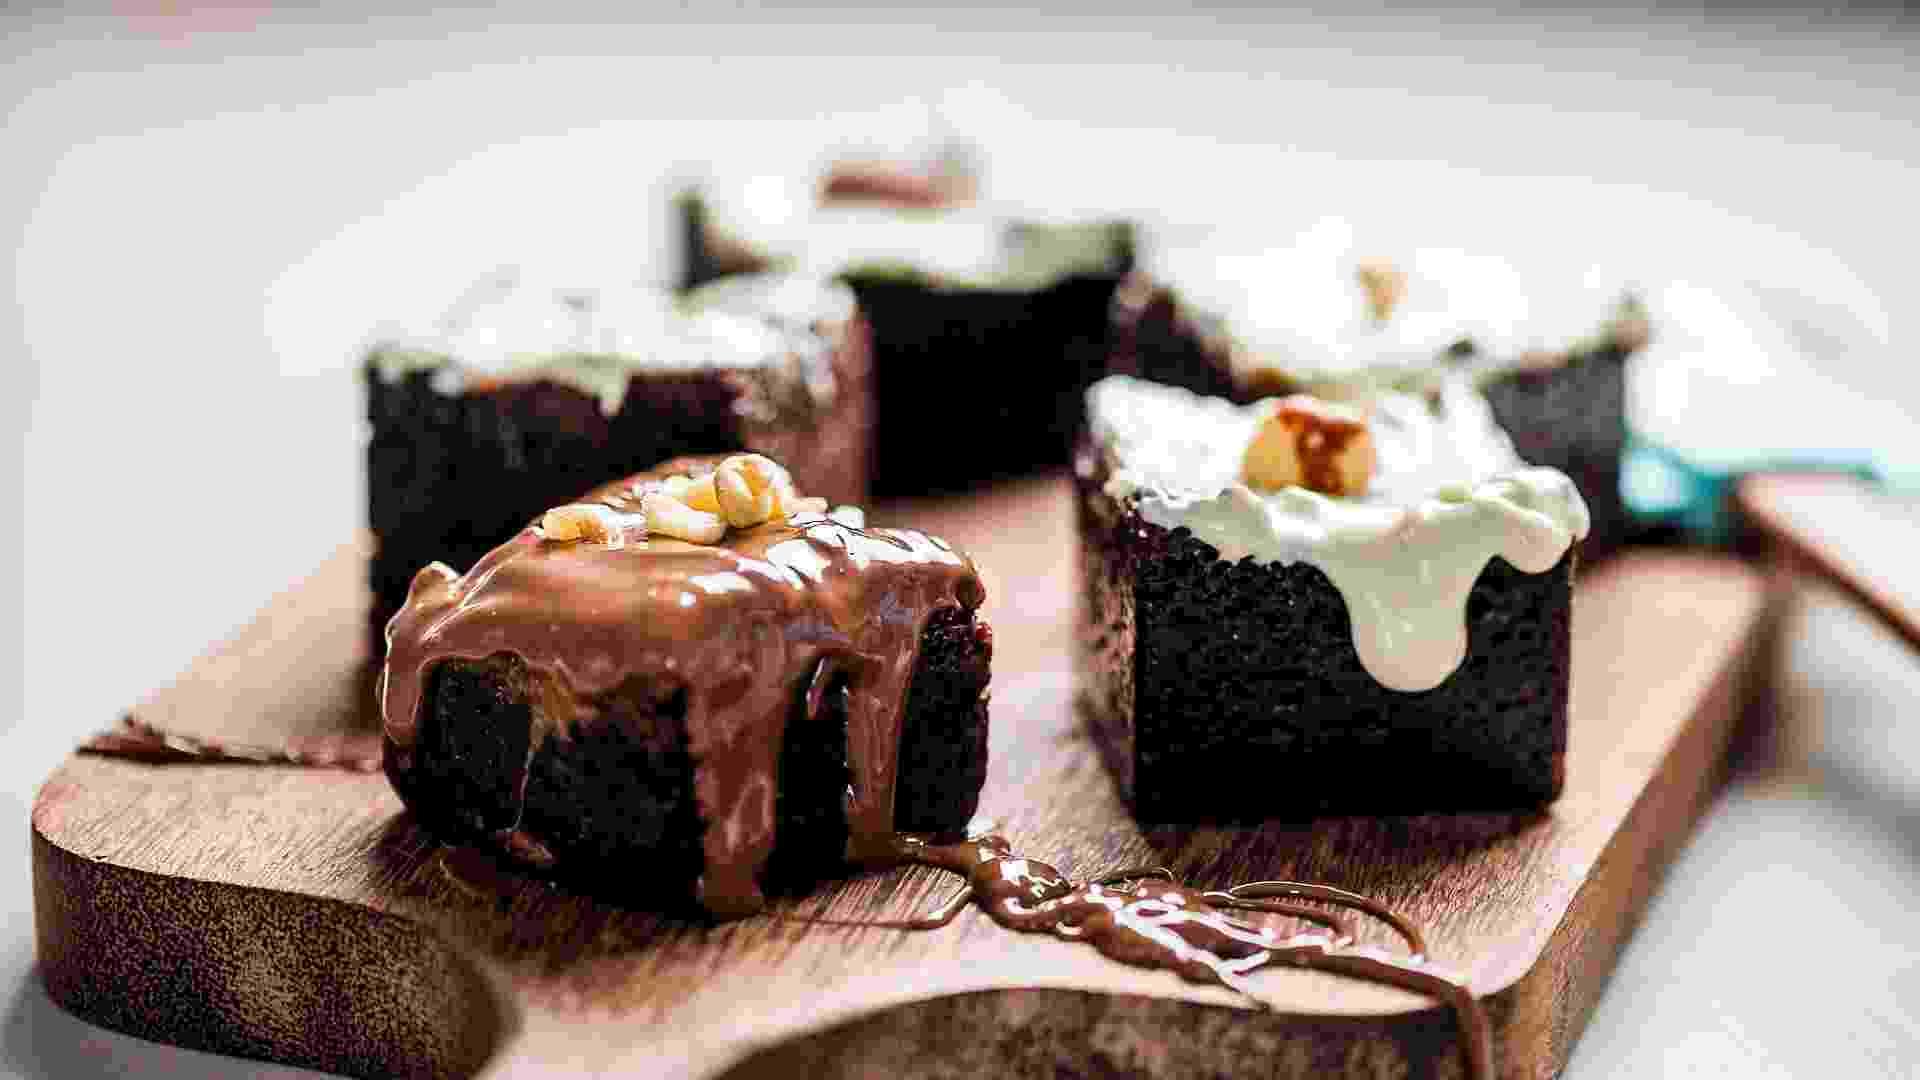 The Brownie Shop, da empreendedora Isabella Delorenzo - Leonardo Soares/UOL